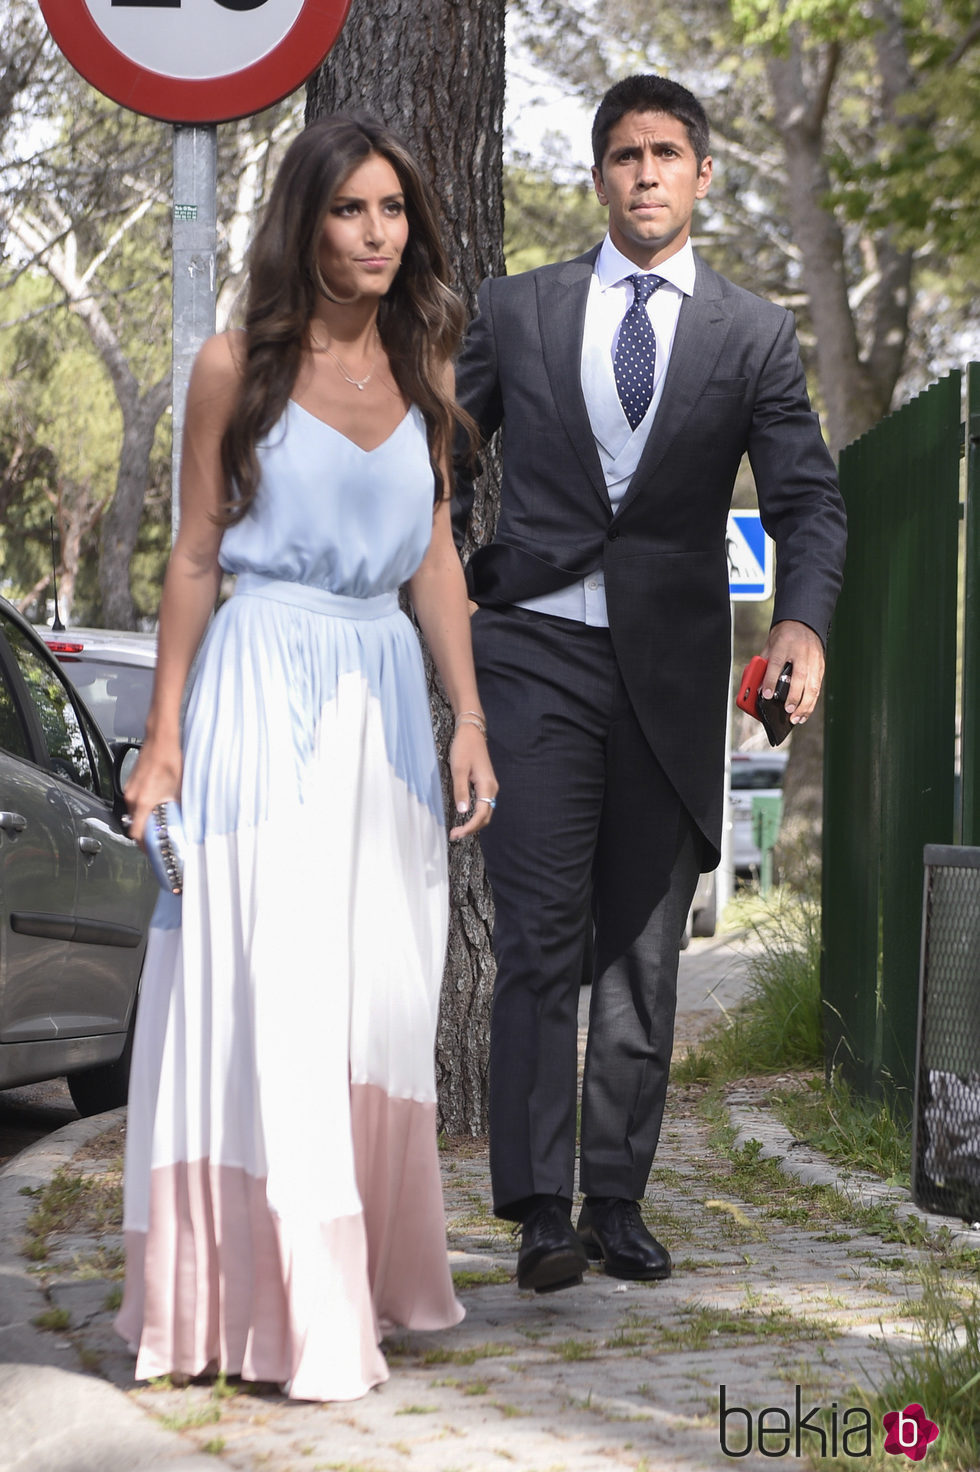 Ana Boyer y Fernando Verdasco en la boda de Sara Verdasco y Juan Carmona